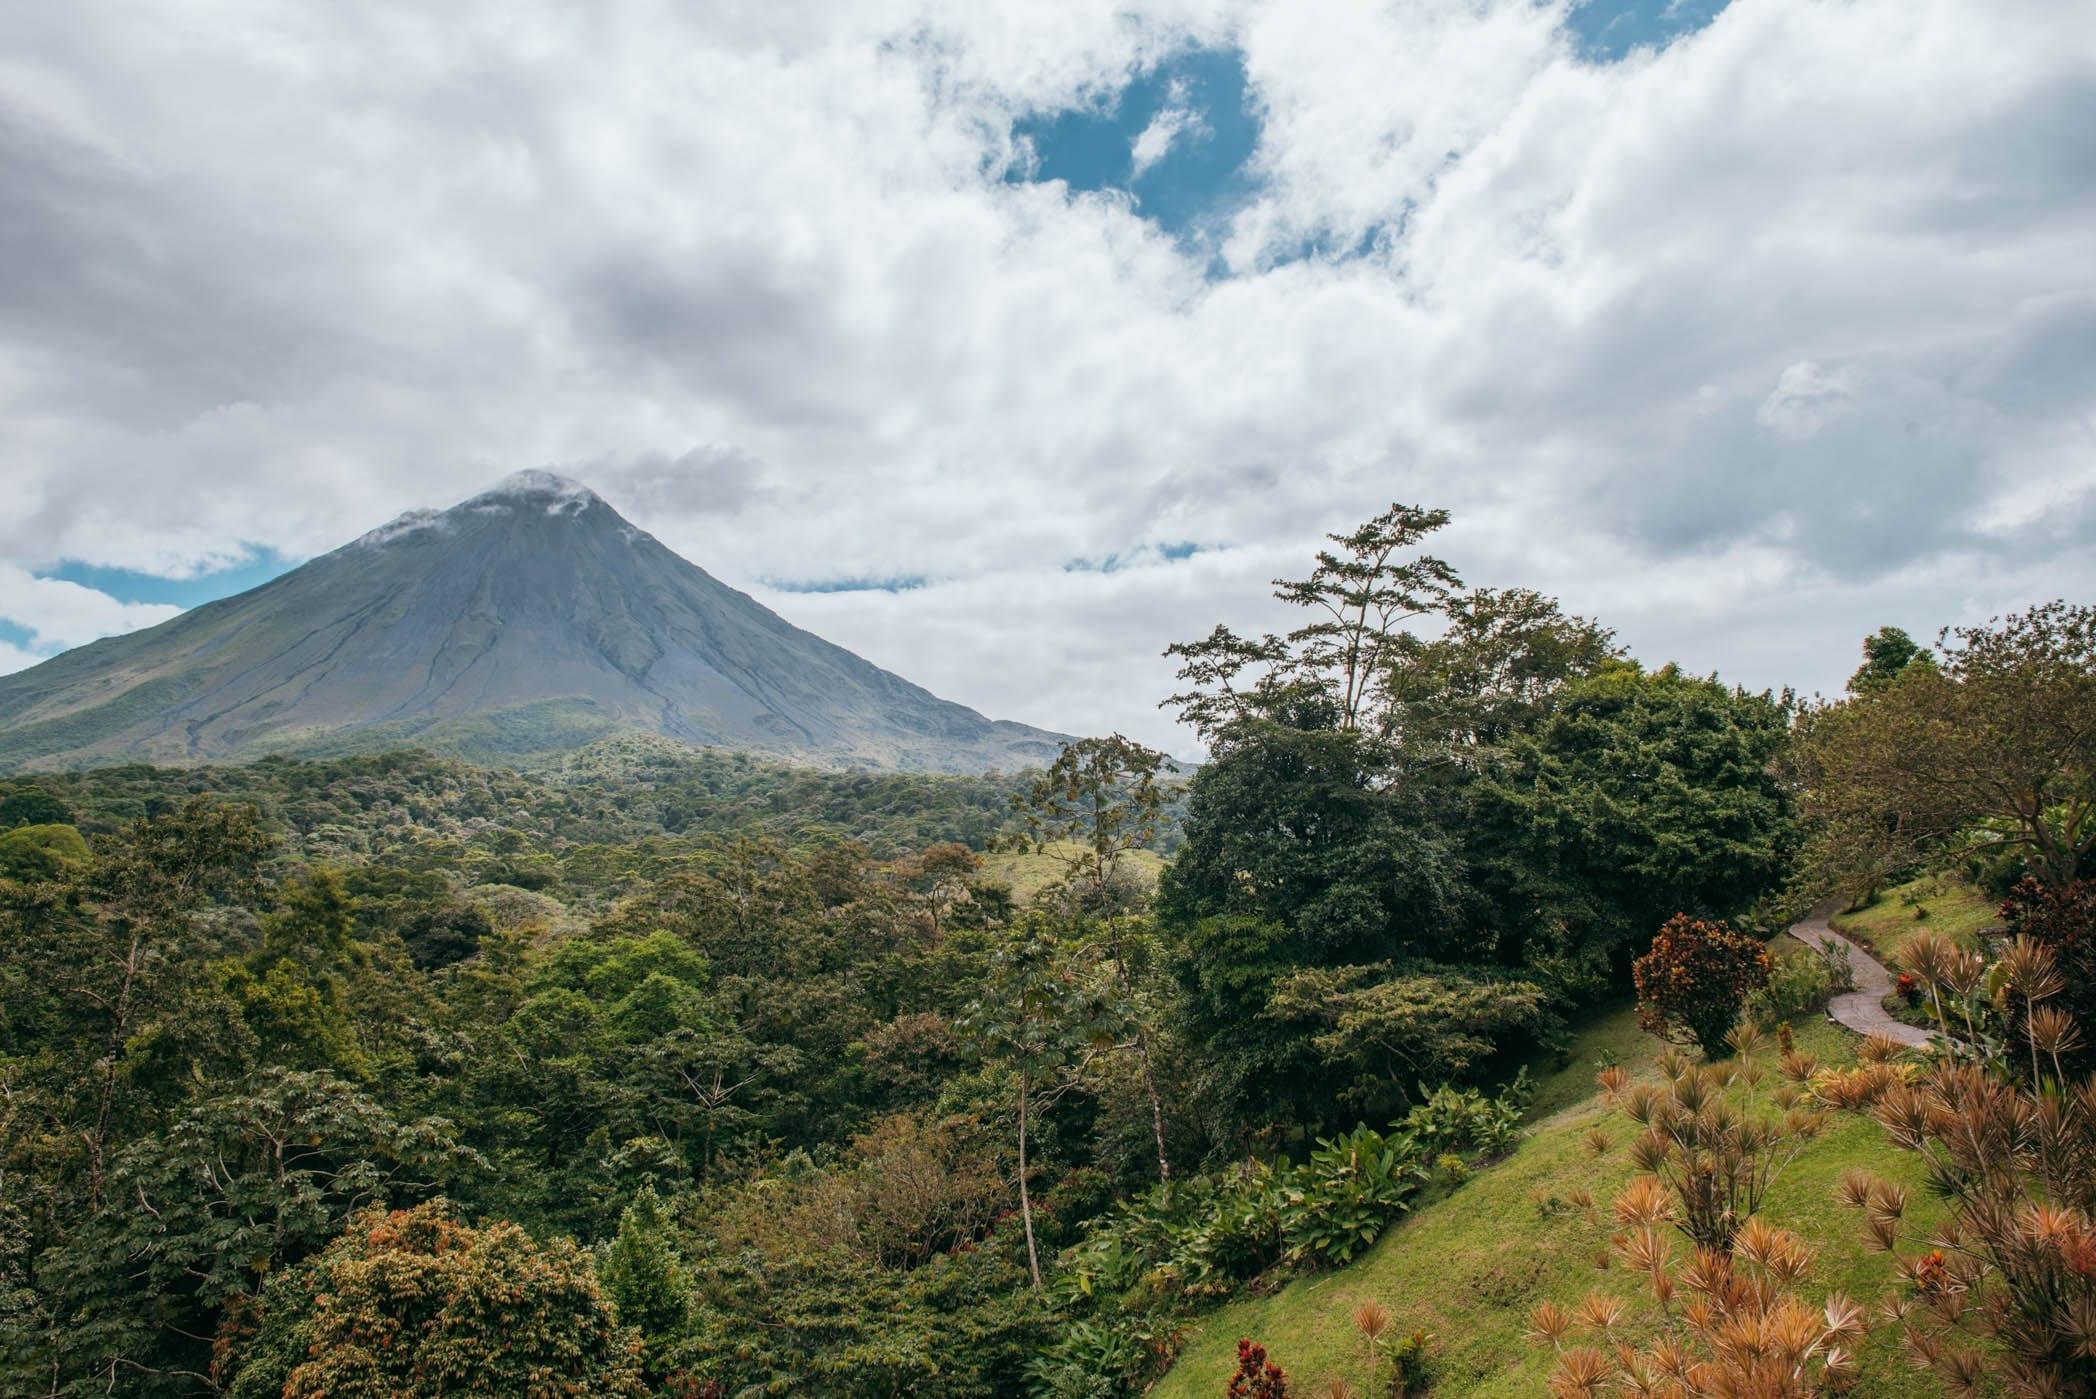 5-Day Costa Rica Itinerary